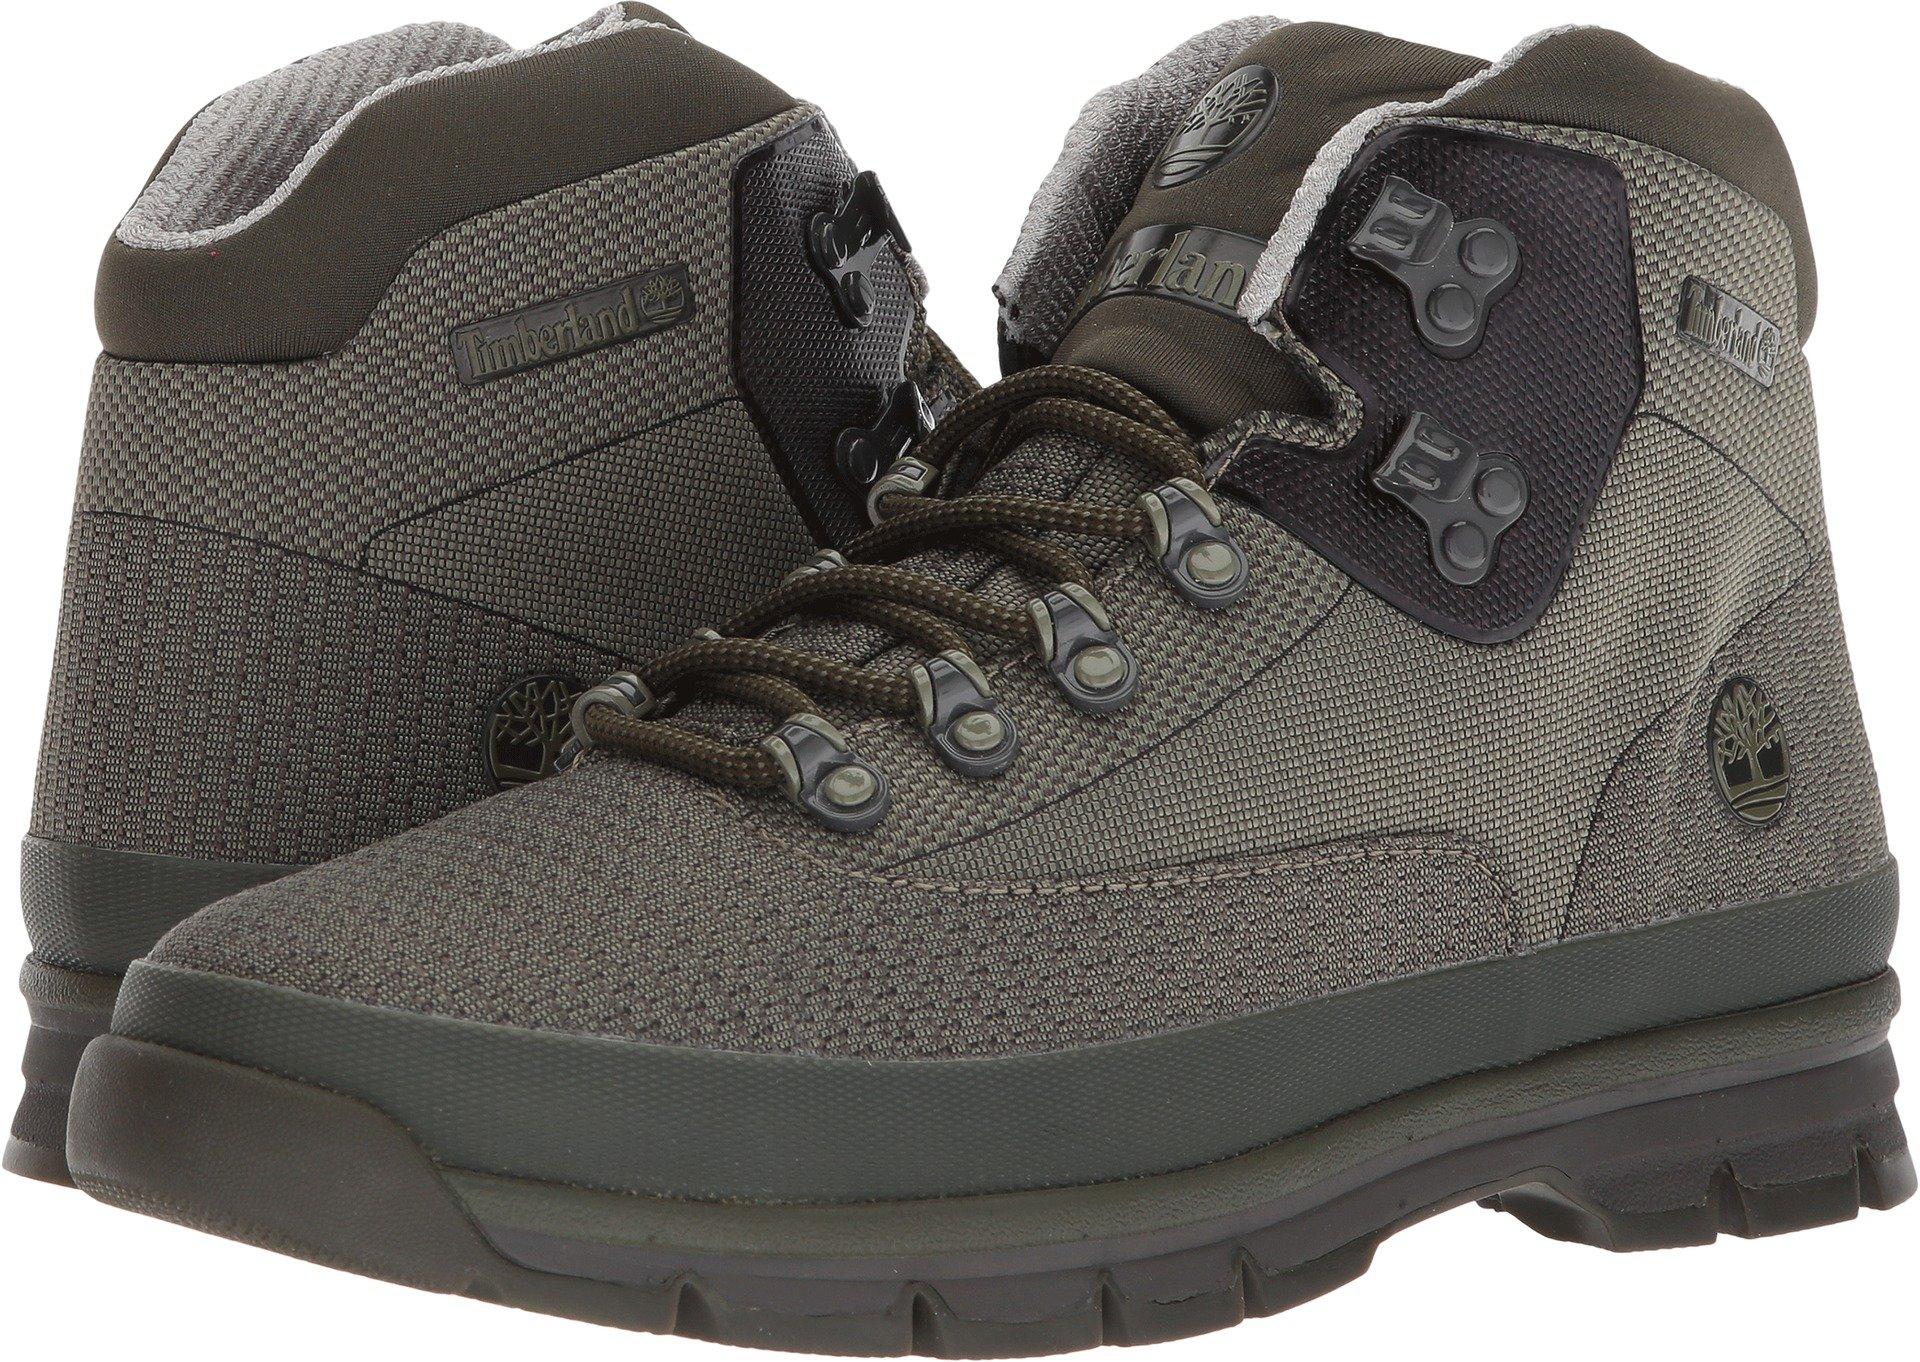 Timberland Euro Hiker Jacquard Boot - Men's Dark Green Jacquard 10.5